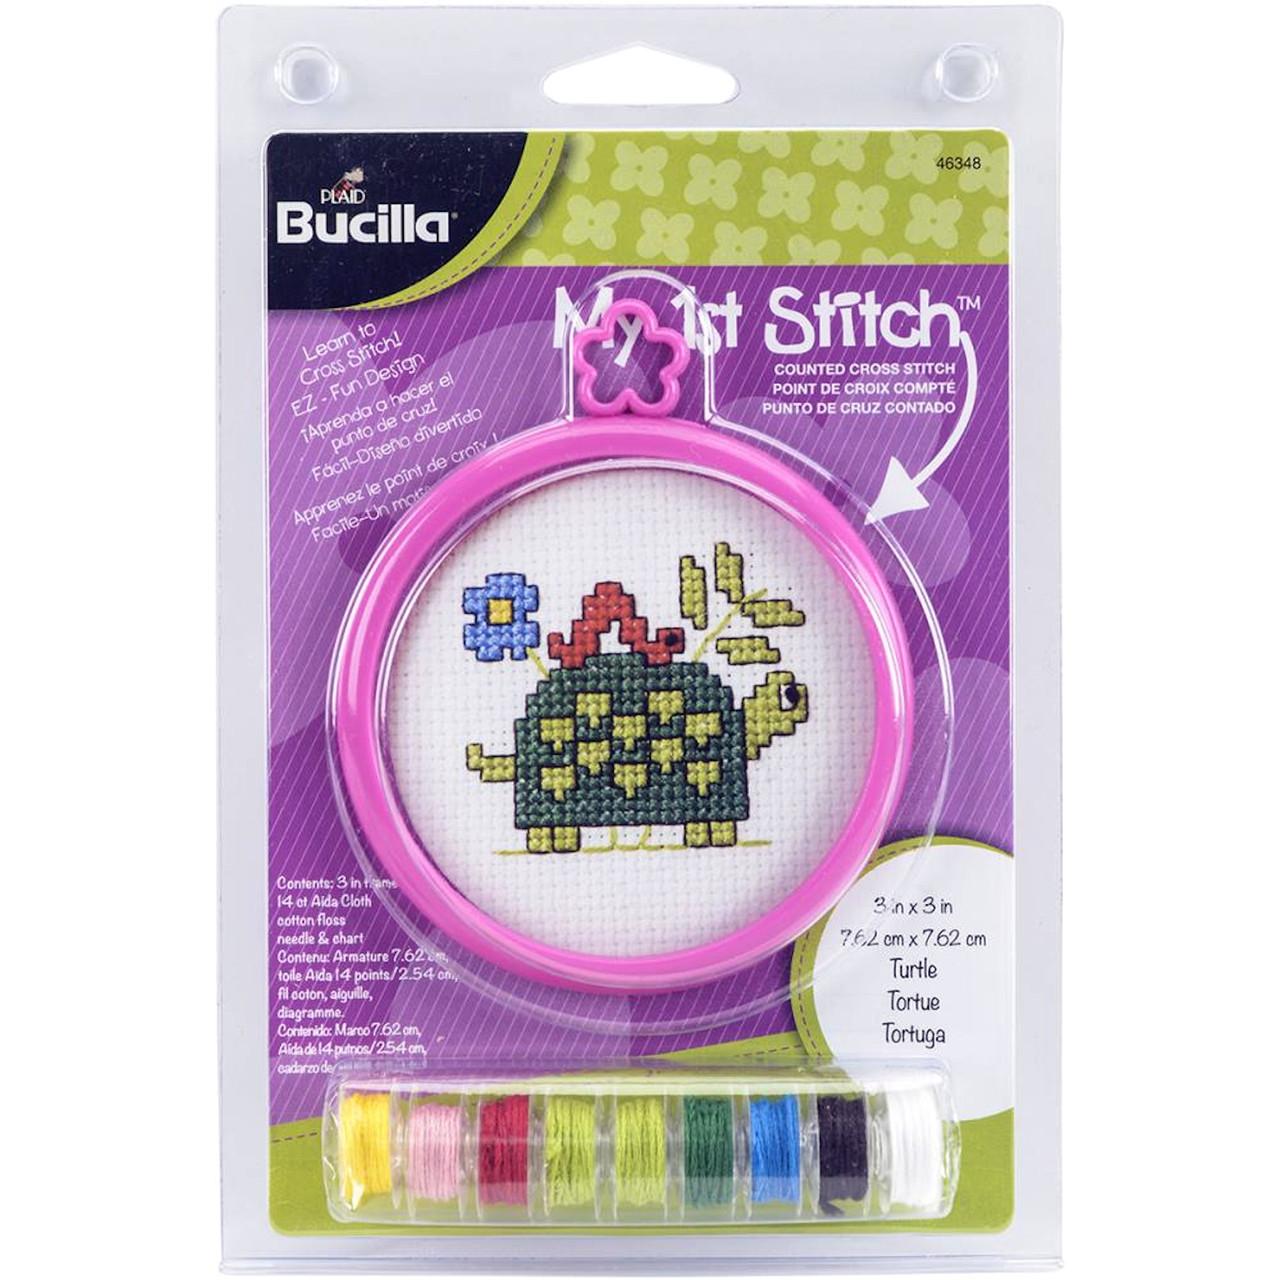 My 1st Stitch - Turtle